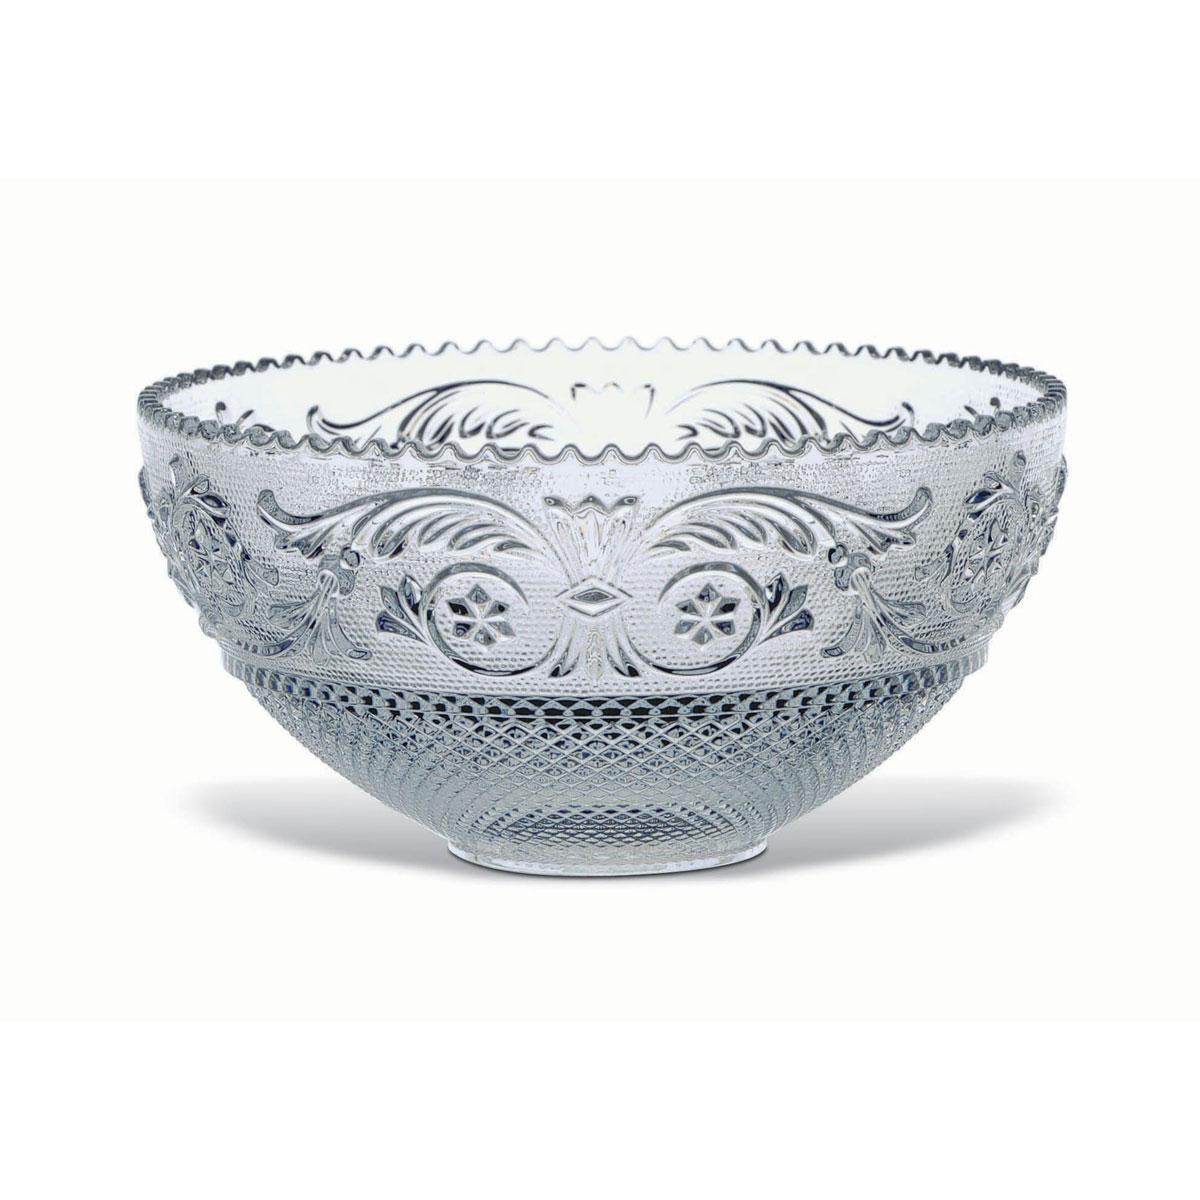 Baccarat Crystal, Arabesque Crystal Bowl, Small